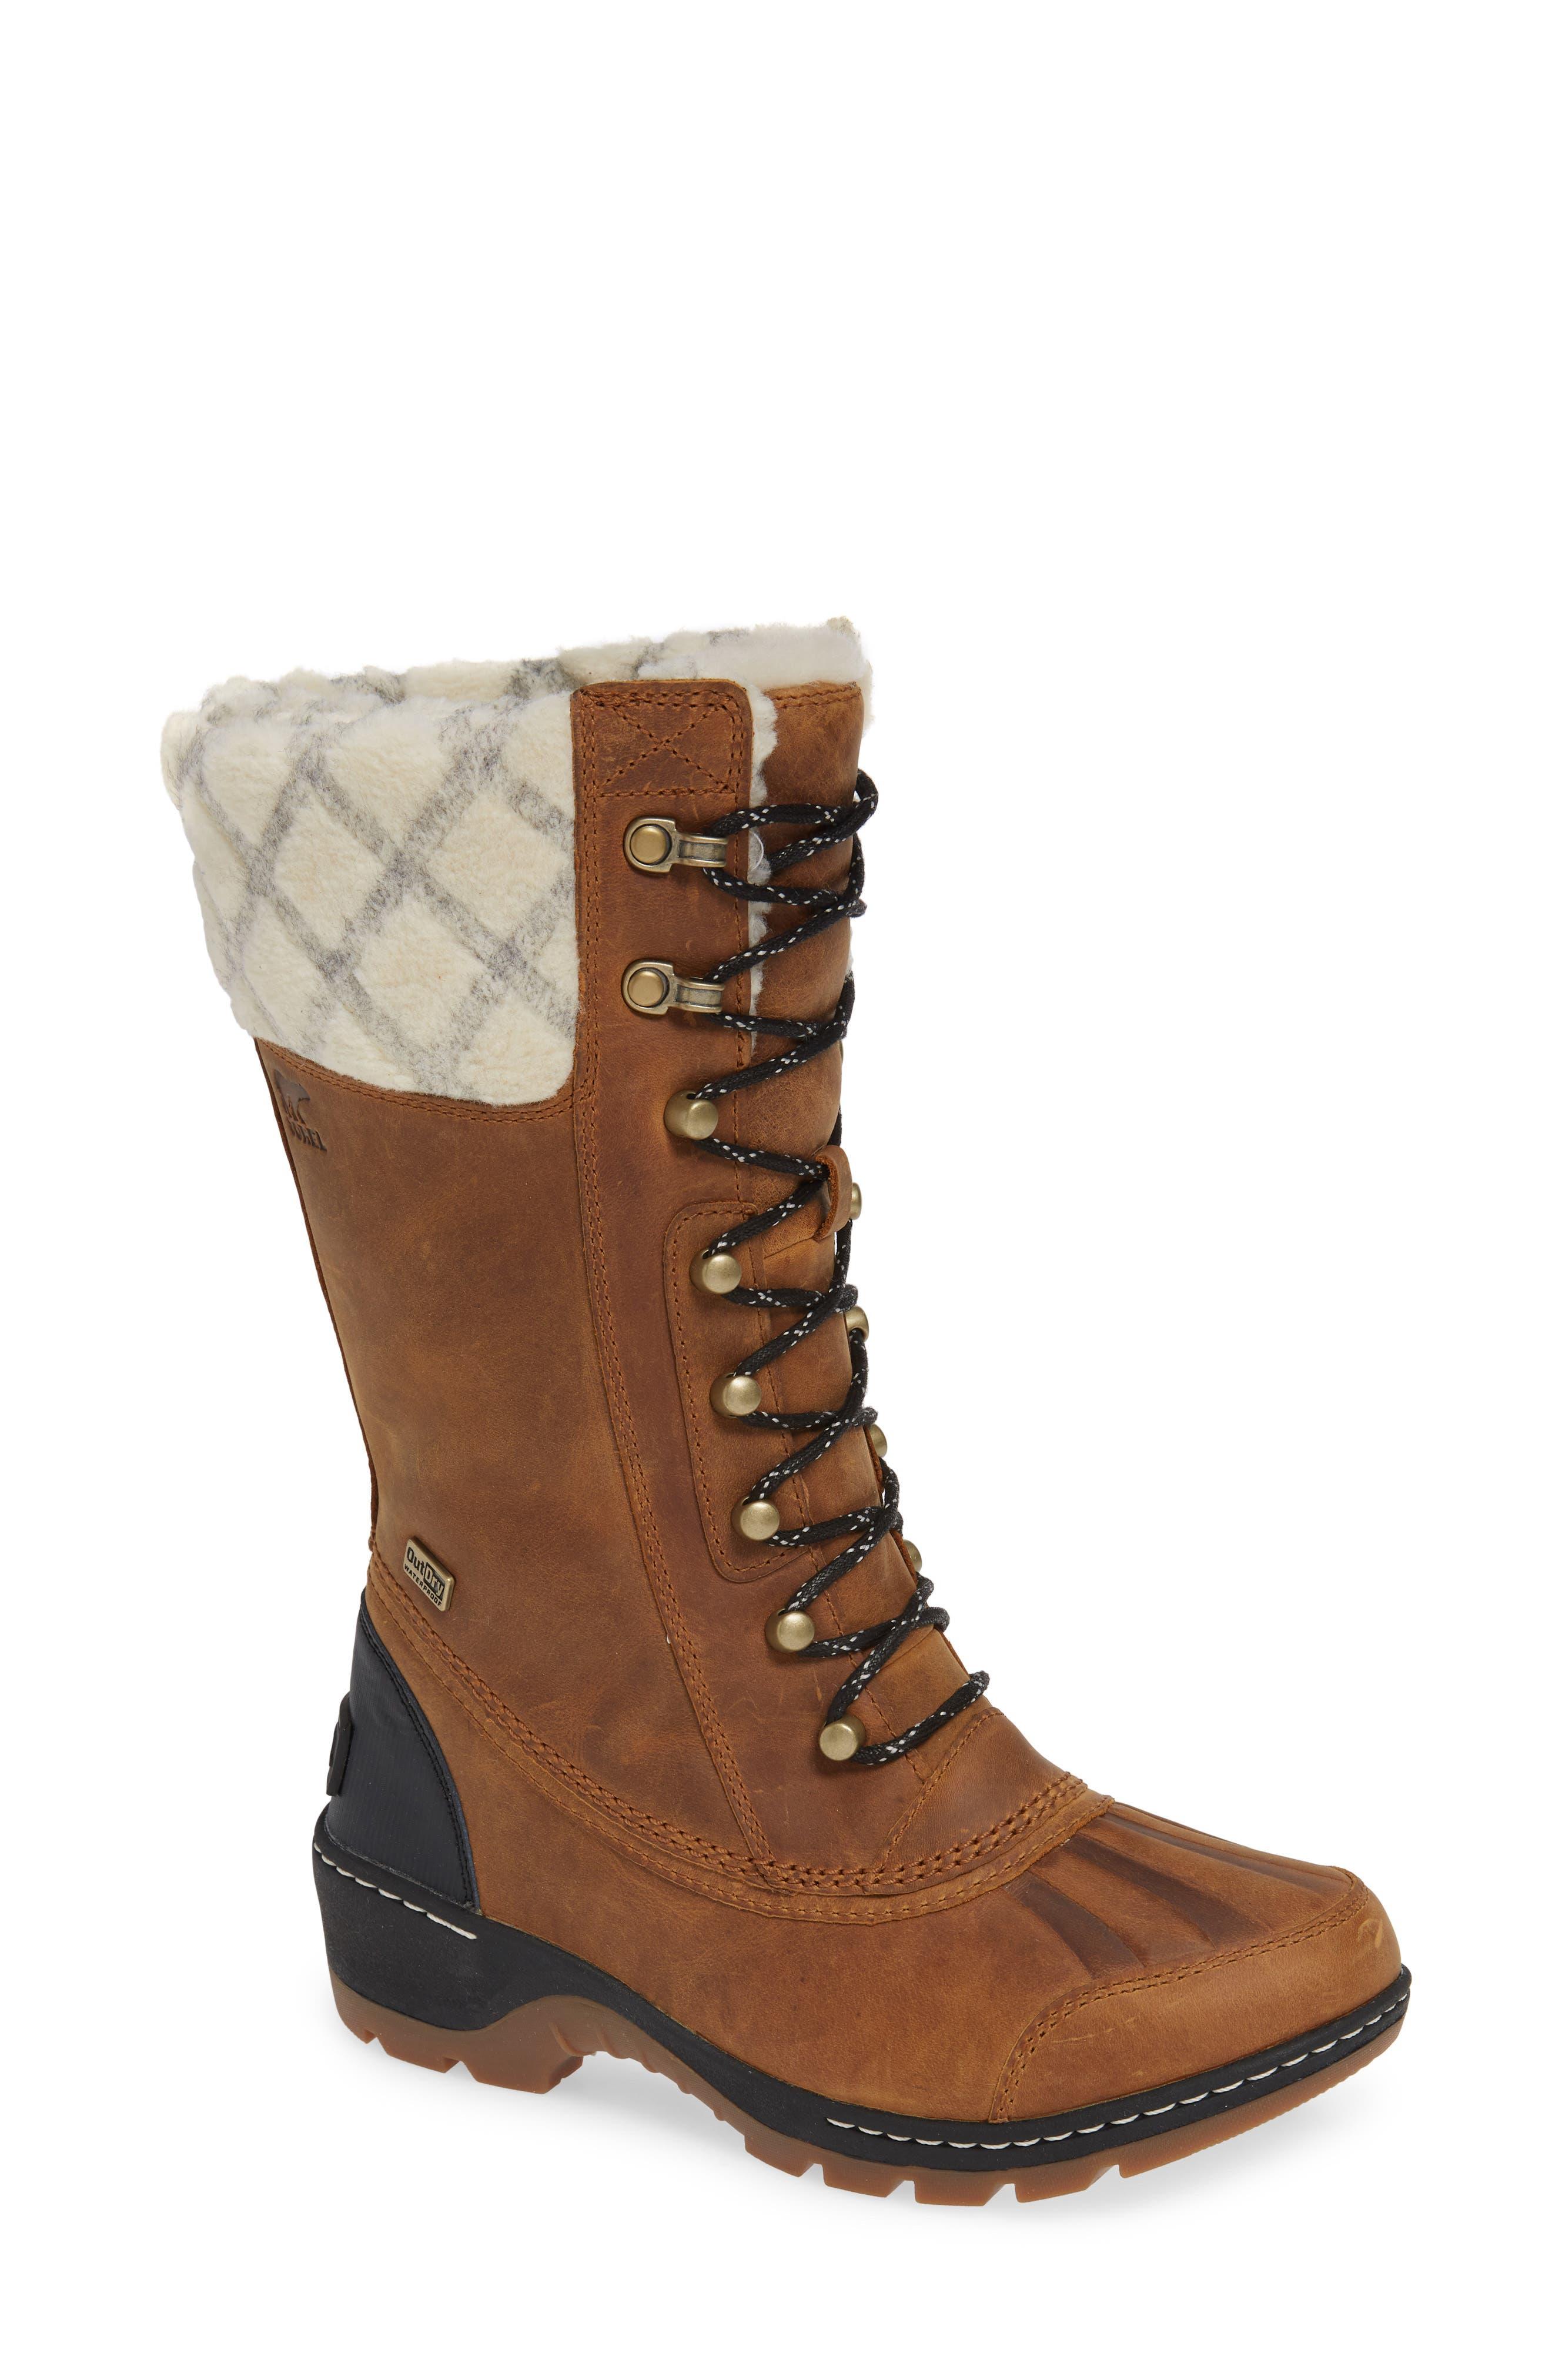 Sorel Whistler(TM) Waterproof Insulated Boot